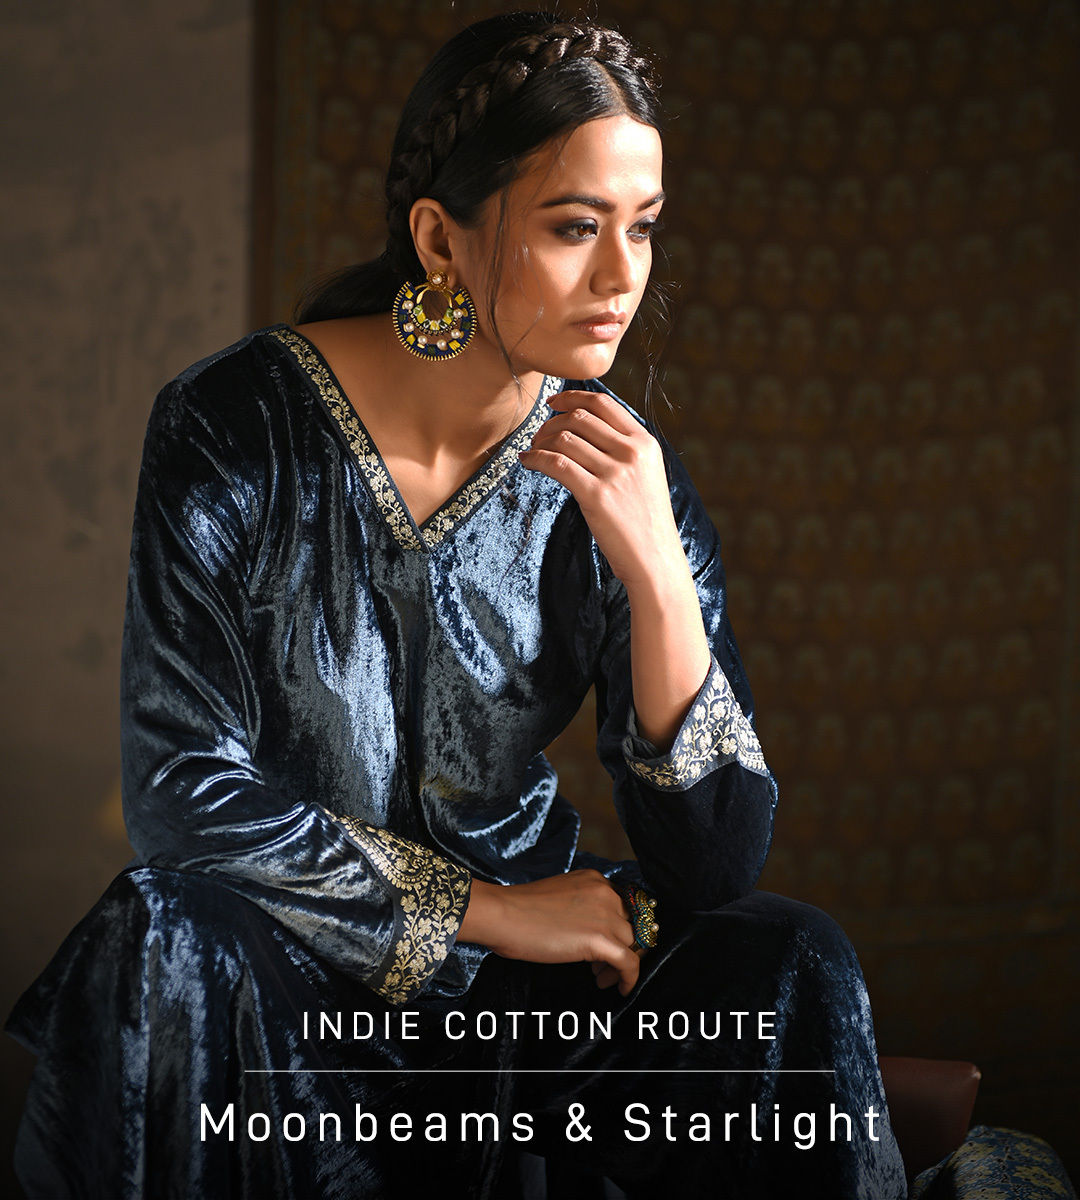 Handblock Batik Printed Pure Cotton Designer Saree Dress With Blouse Piece Skin Friendly Gift For Her Indian Wedding Dress Women S Clothing Dresses Women S Clothing